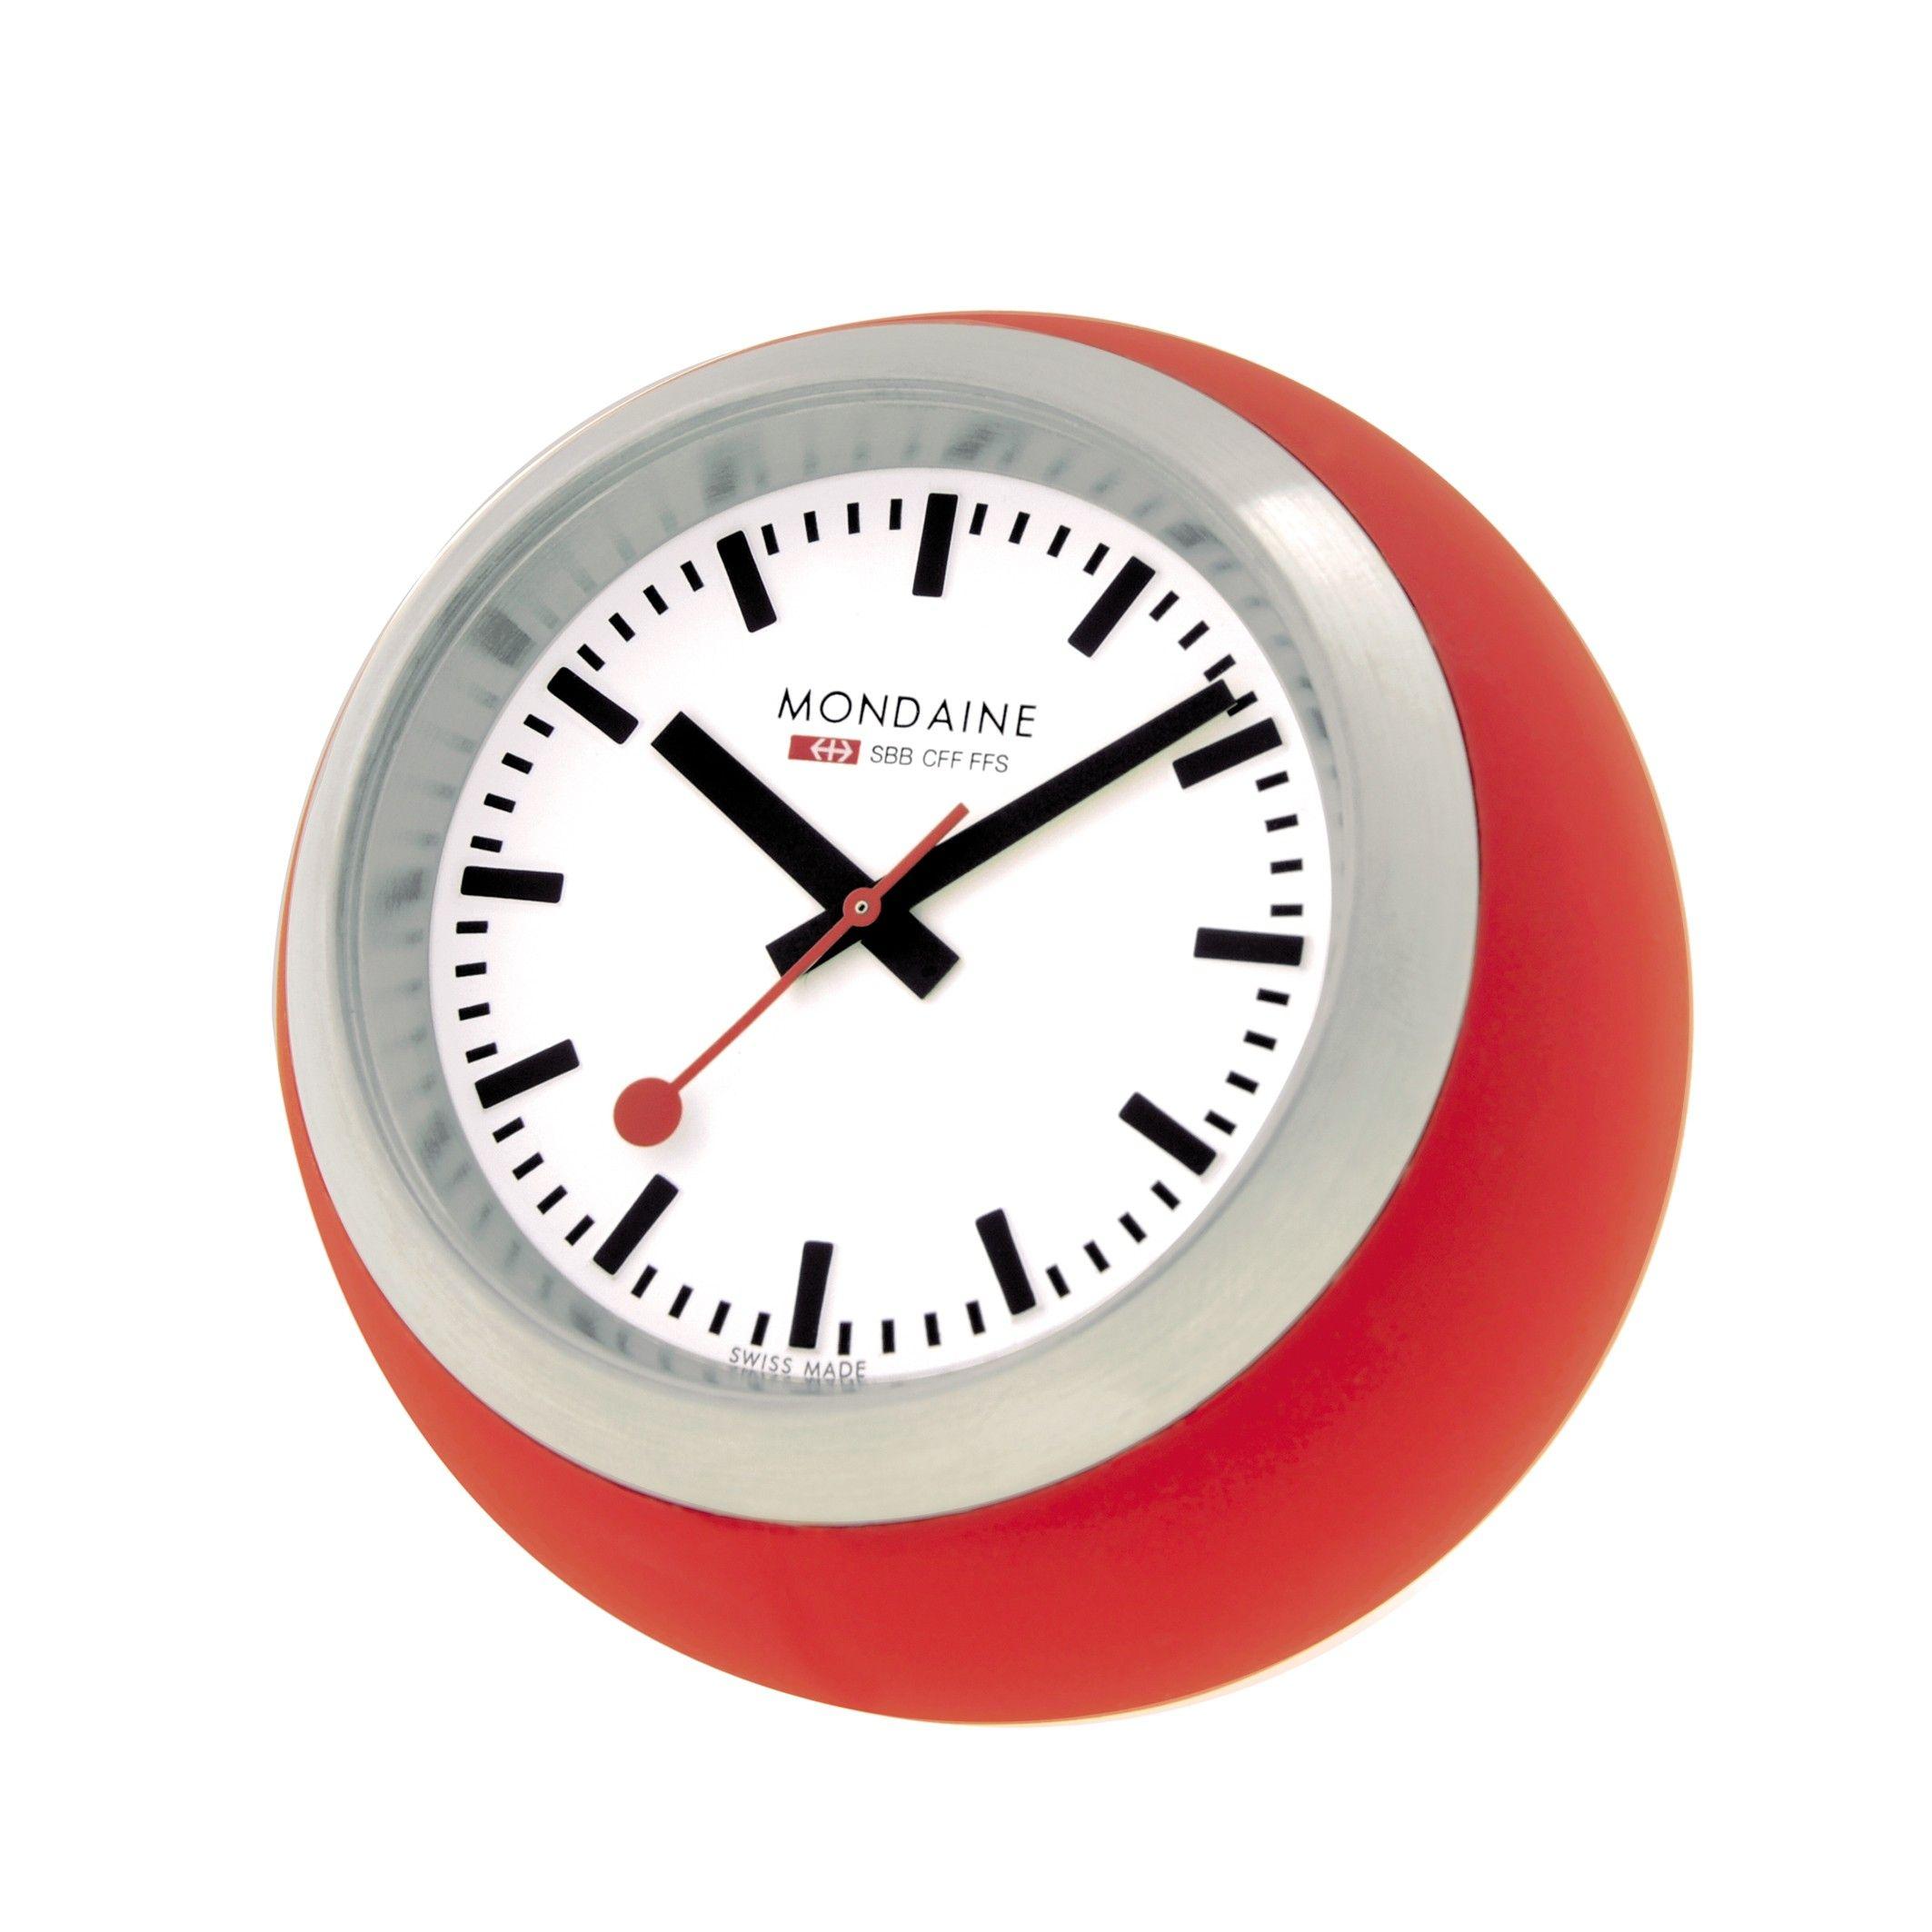 Mondaine Official Railways Globe Clock Red